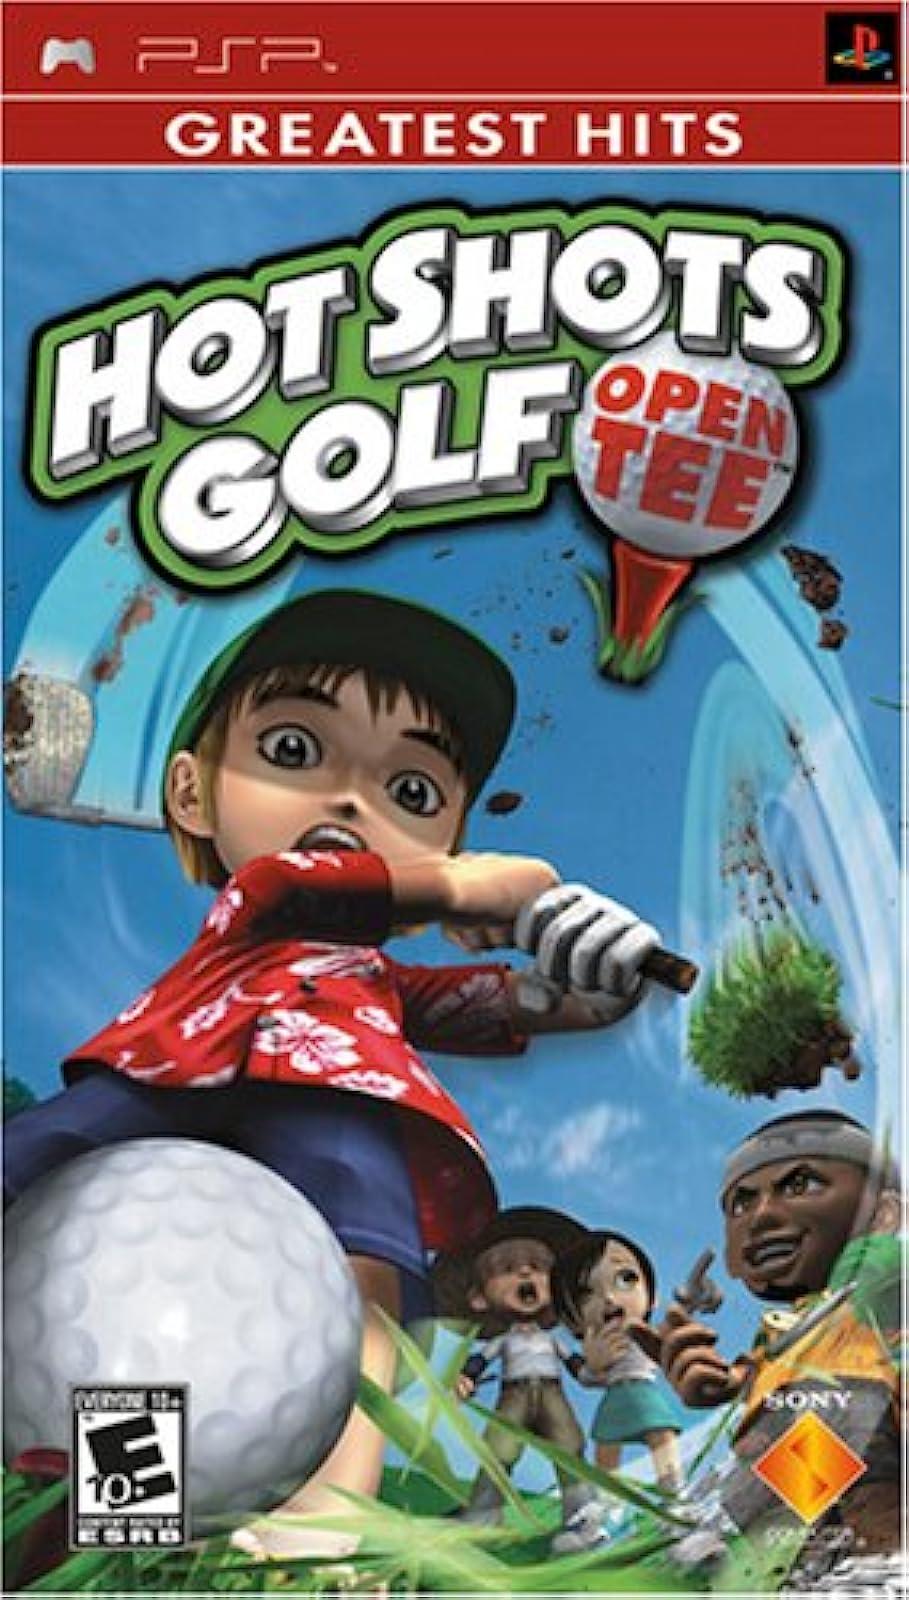 Hot Shots Golf Open Tee Sony For PSP UMD